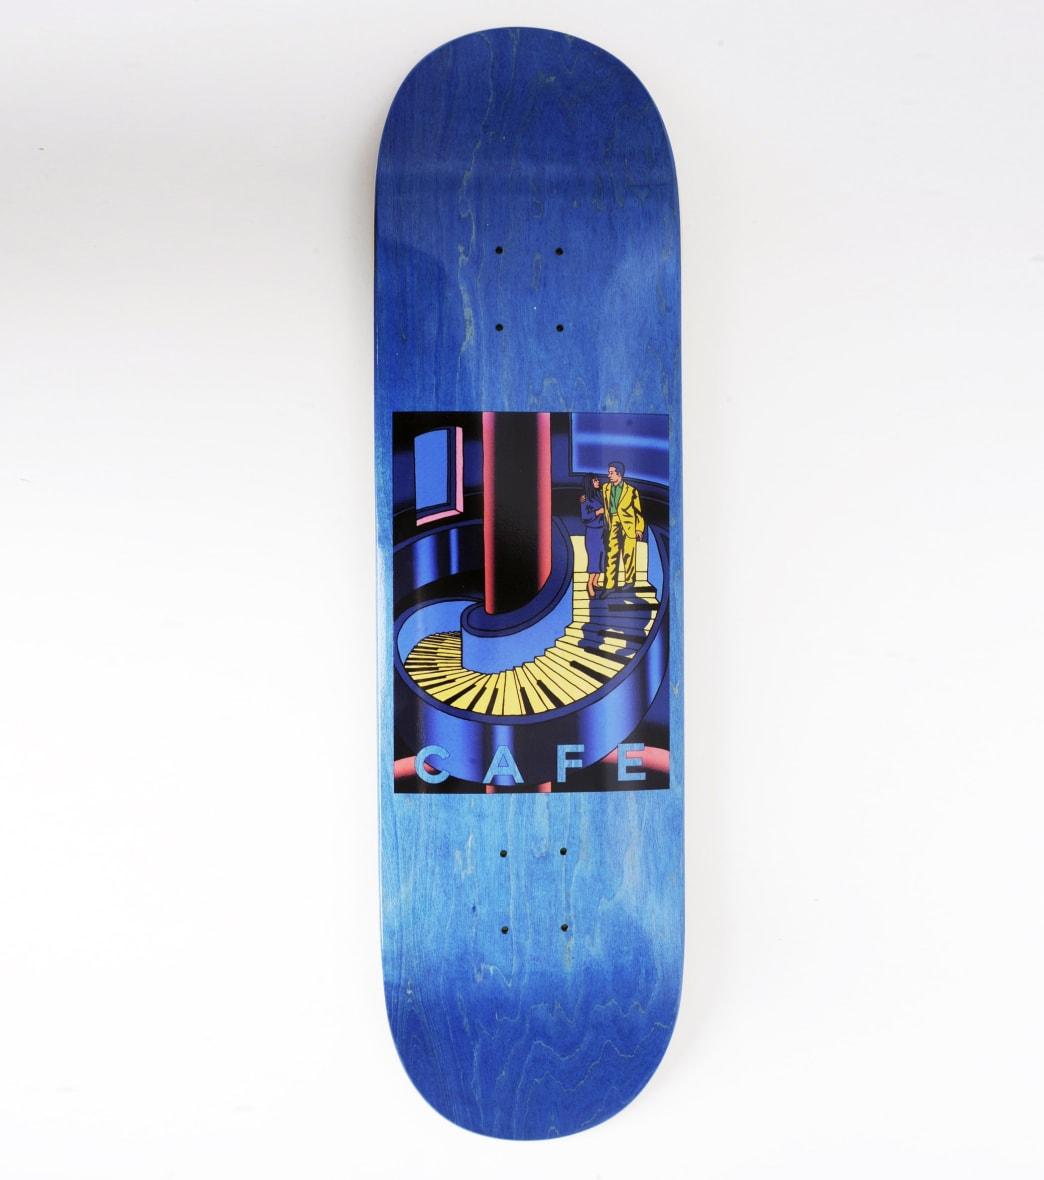 "Skateboard Cafe Piano Staircase Skateboard Deck Blue Woodstain - 8.375""   Deck by Skateboard Cafe 1"